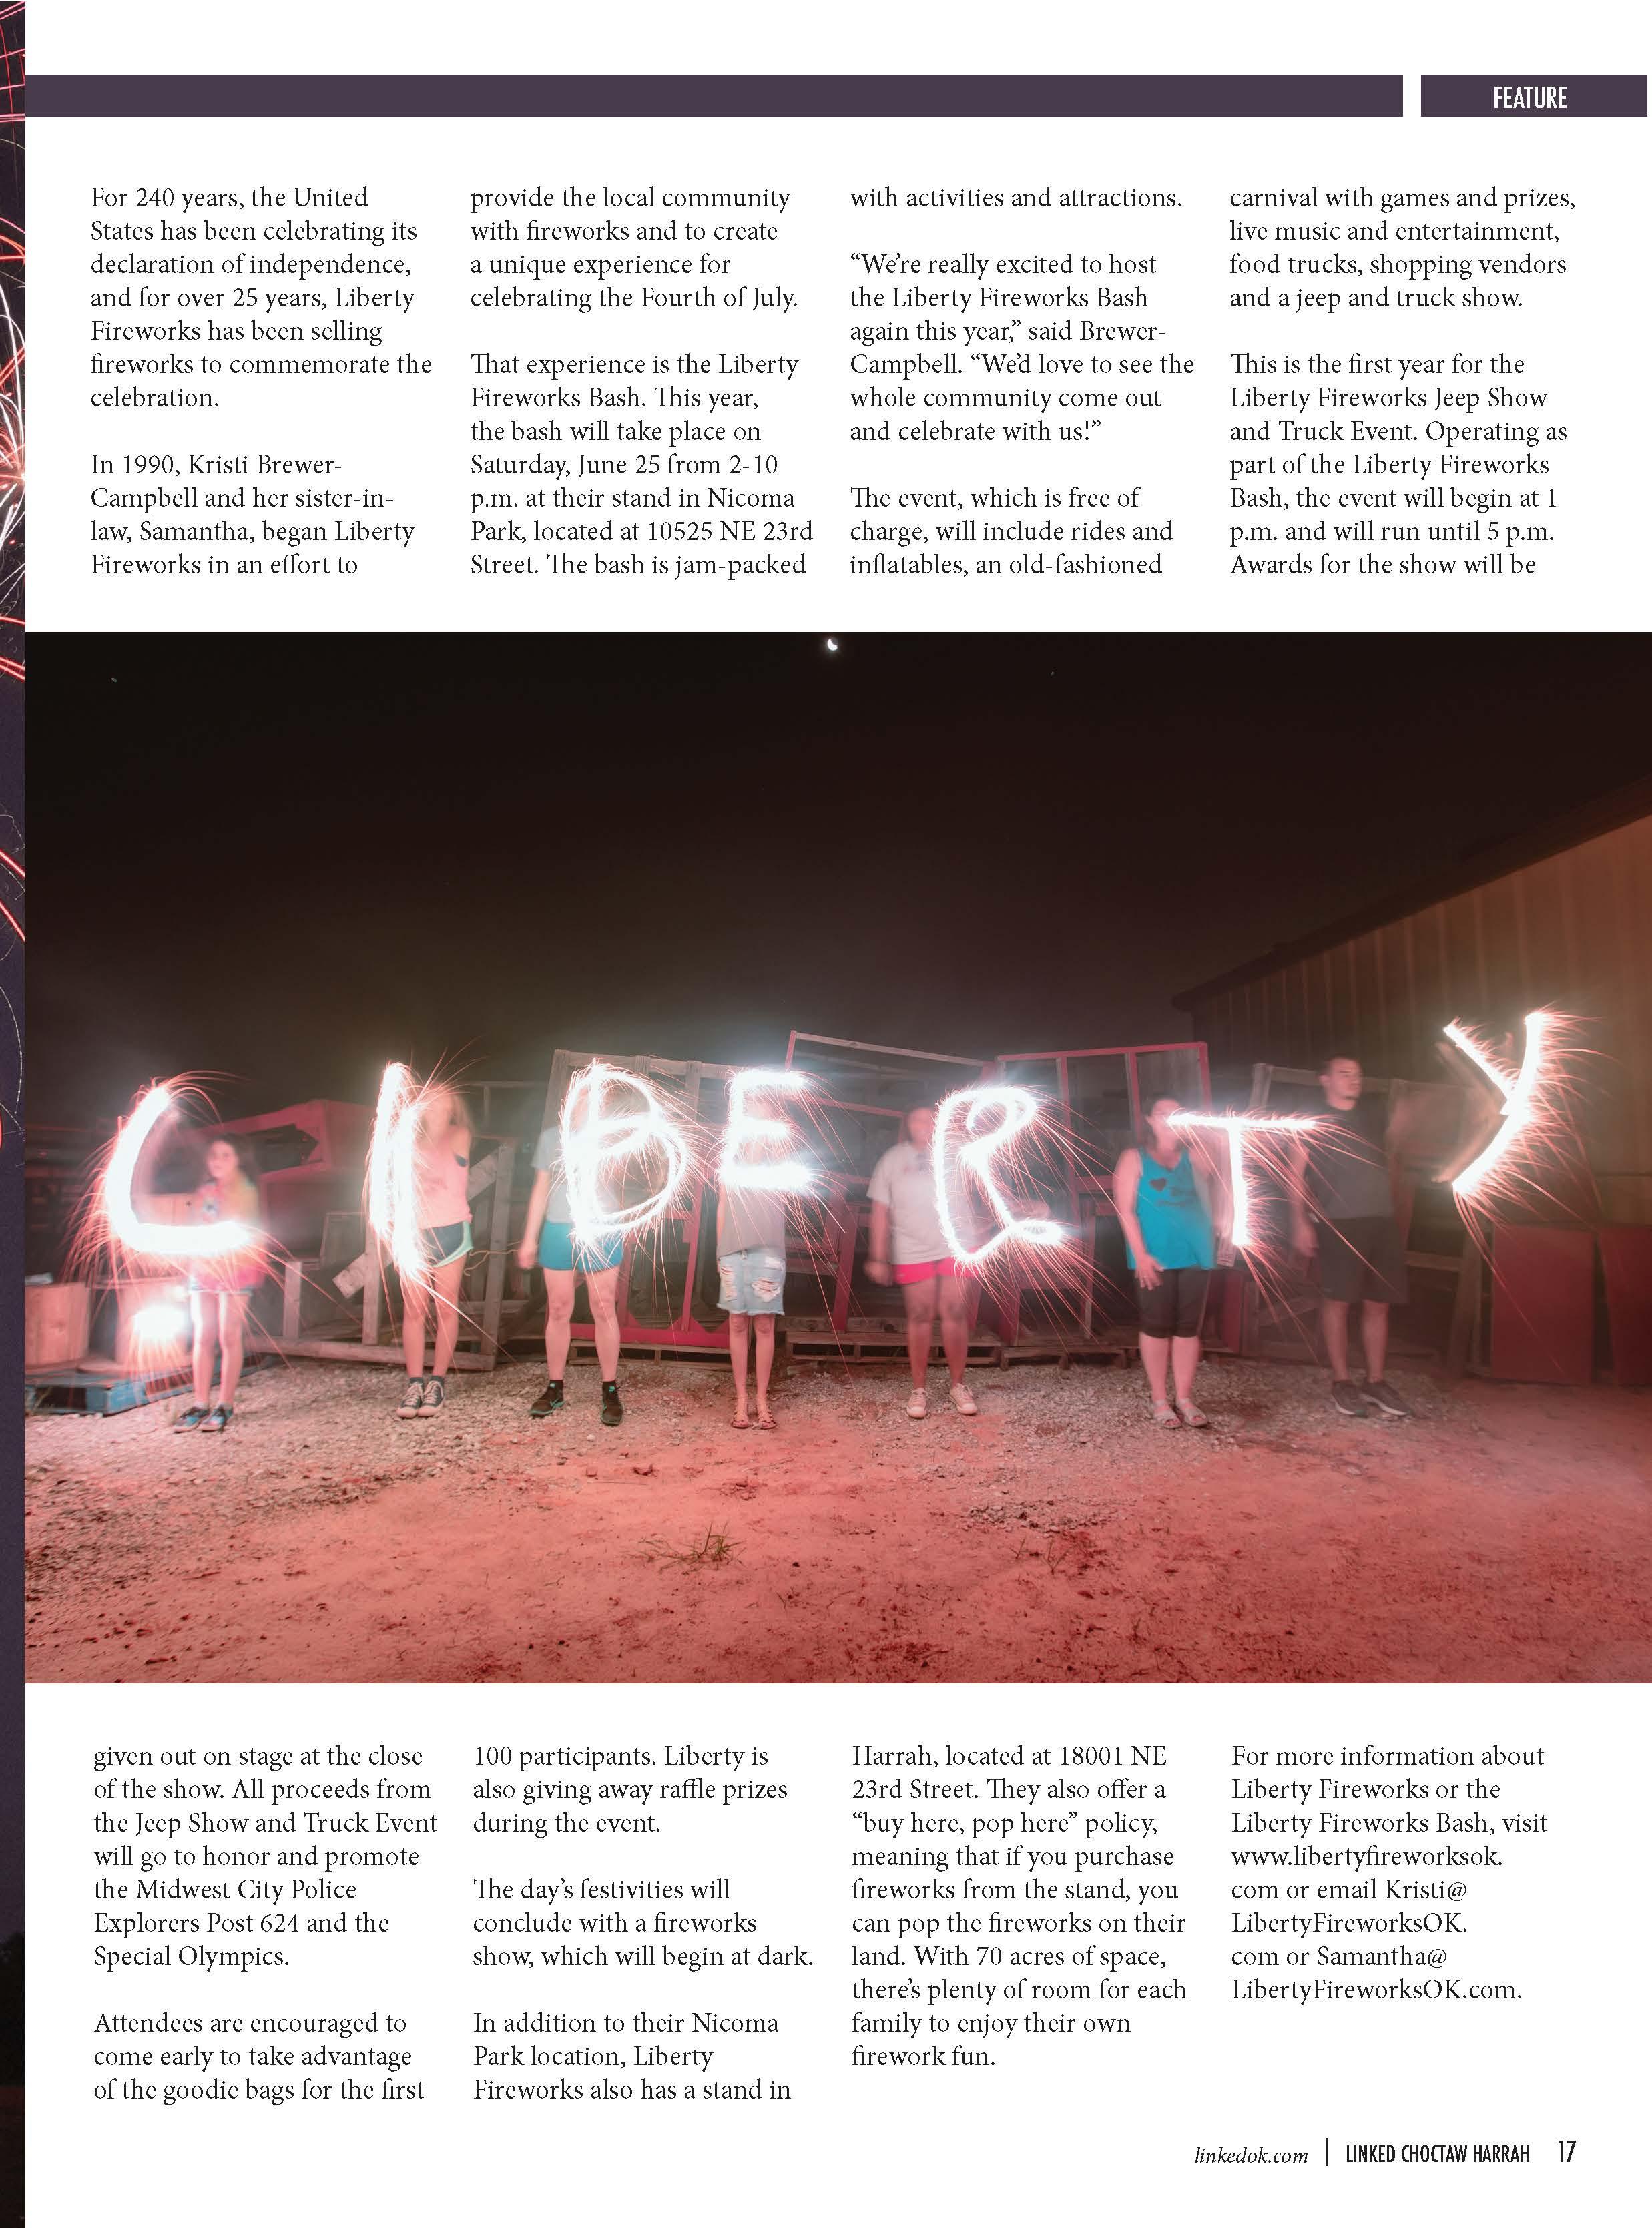 HighFive_ChoctawHarrah_June 2016 REVISED_Page_17.jpg